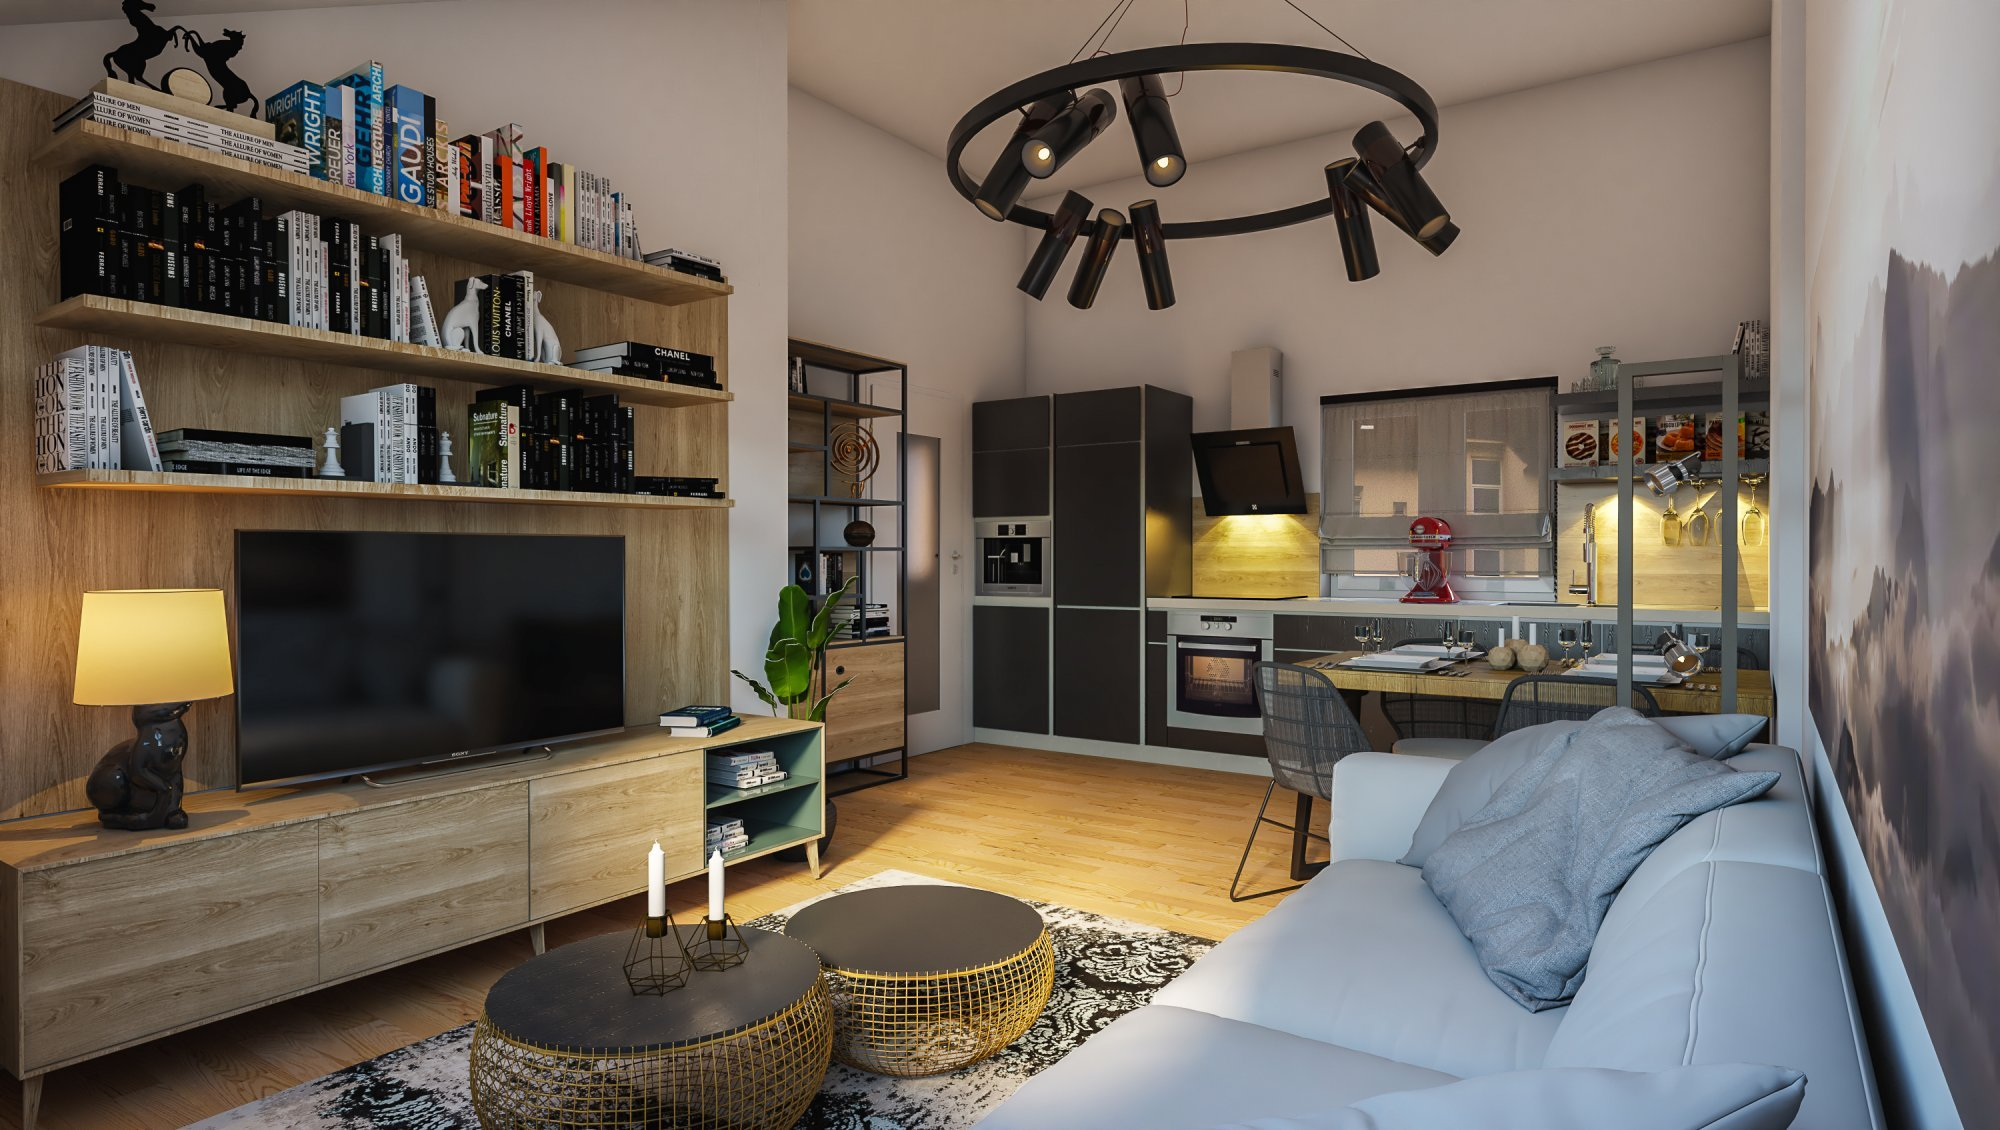 Půdní byt 2+kk, plocha 46 m², ulice Viklefova, Praha 8 - Žižkov | 1